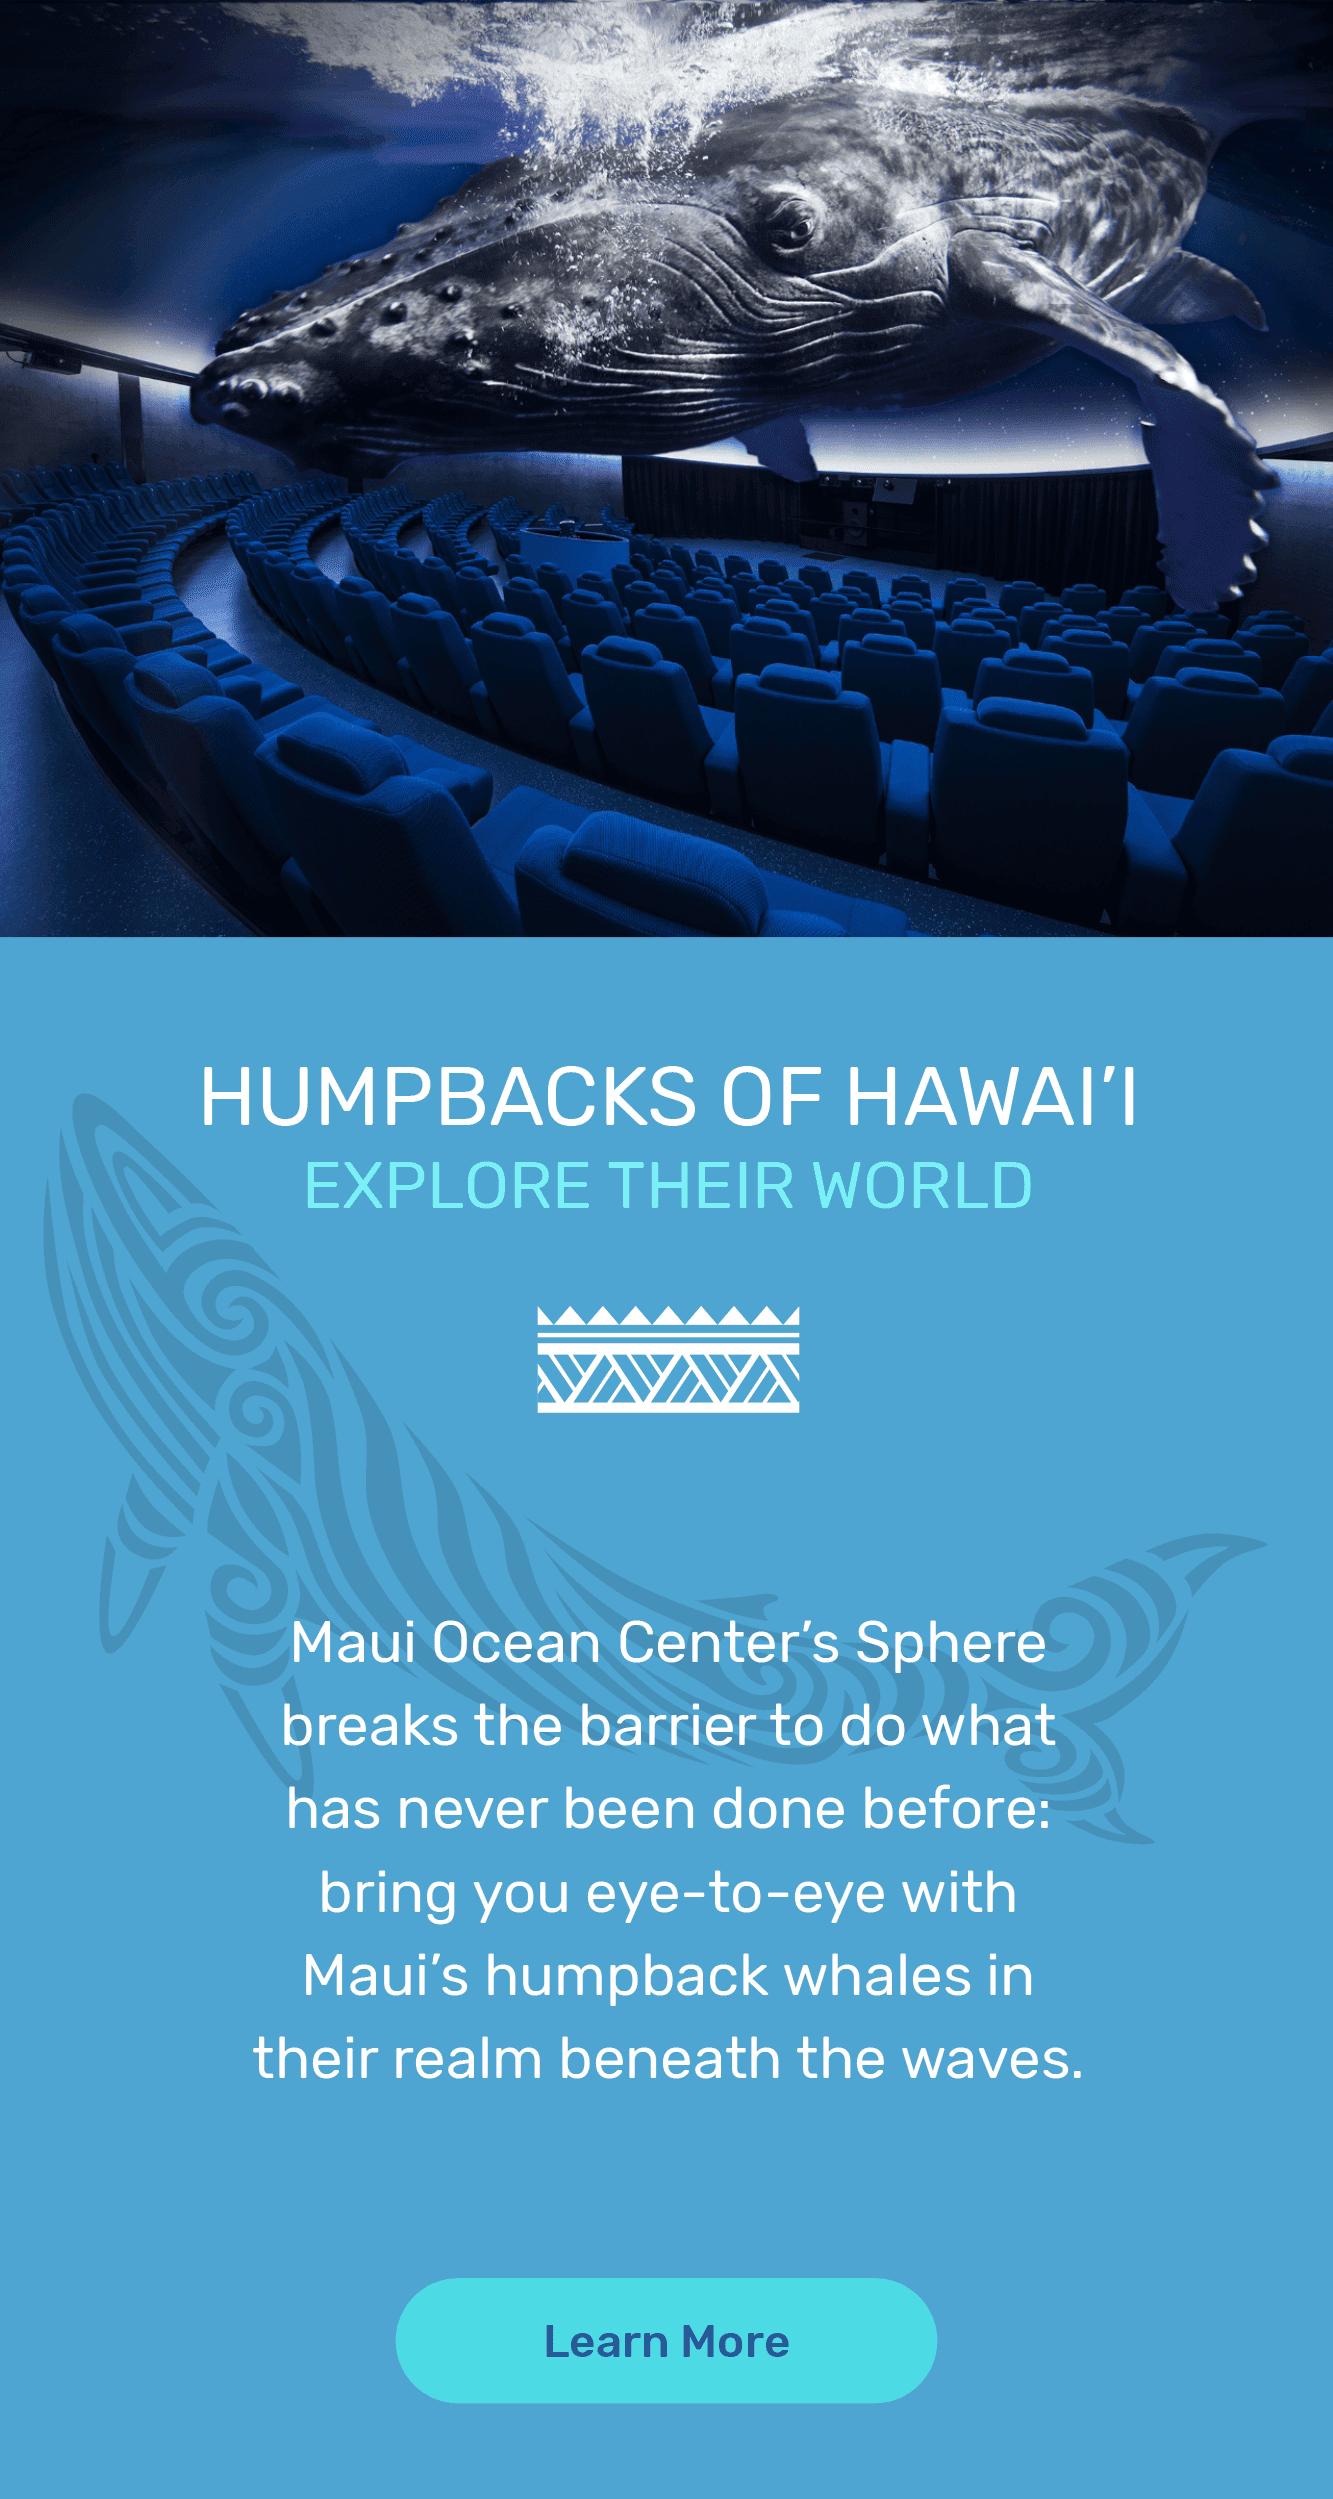 Humpbacks of Hawai'i